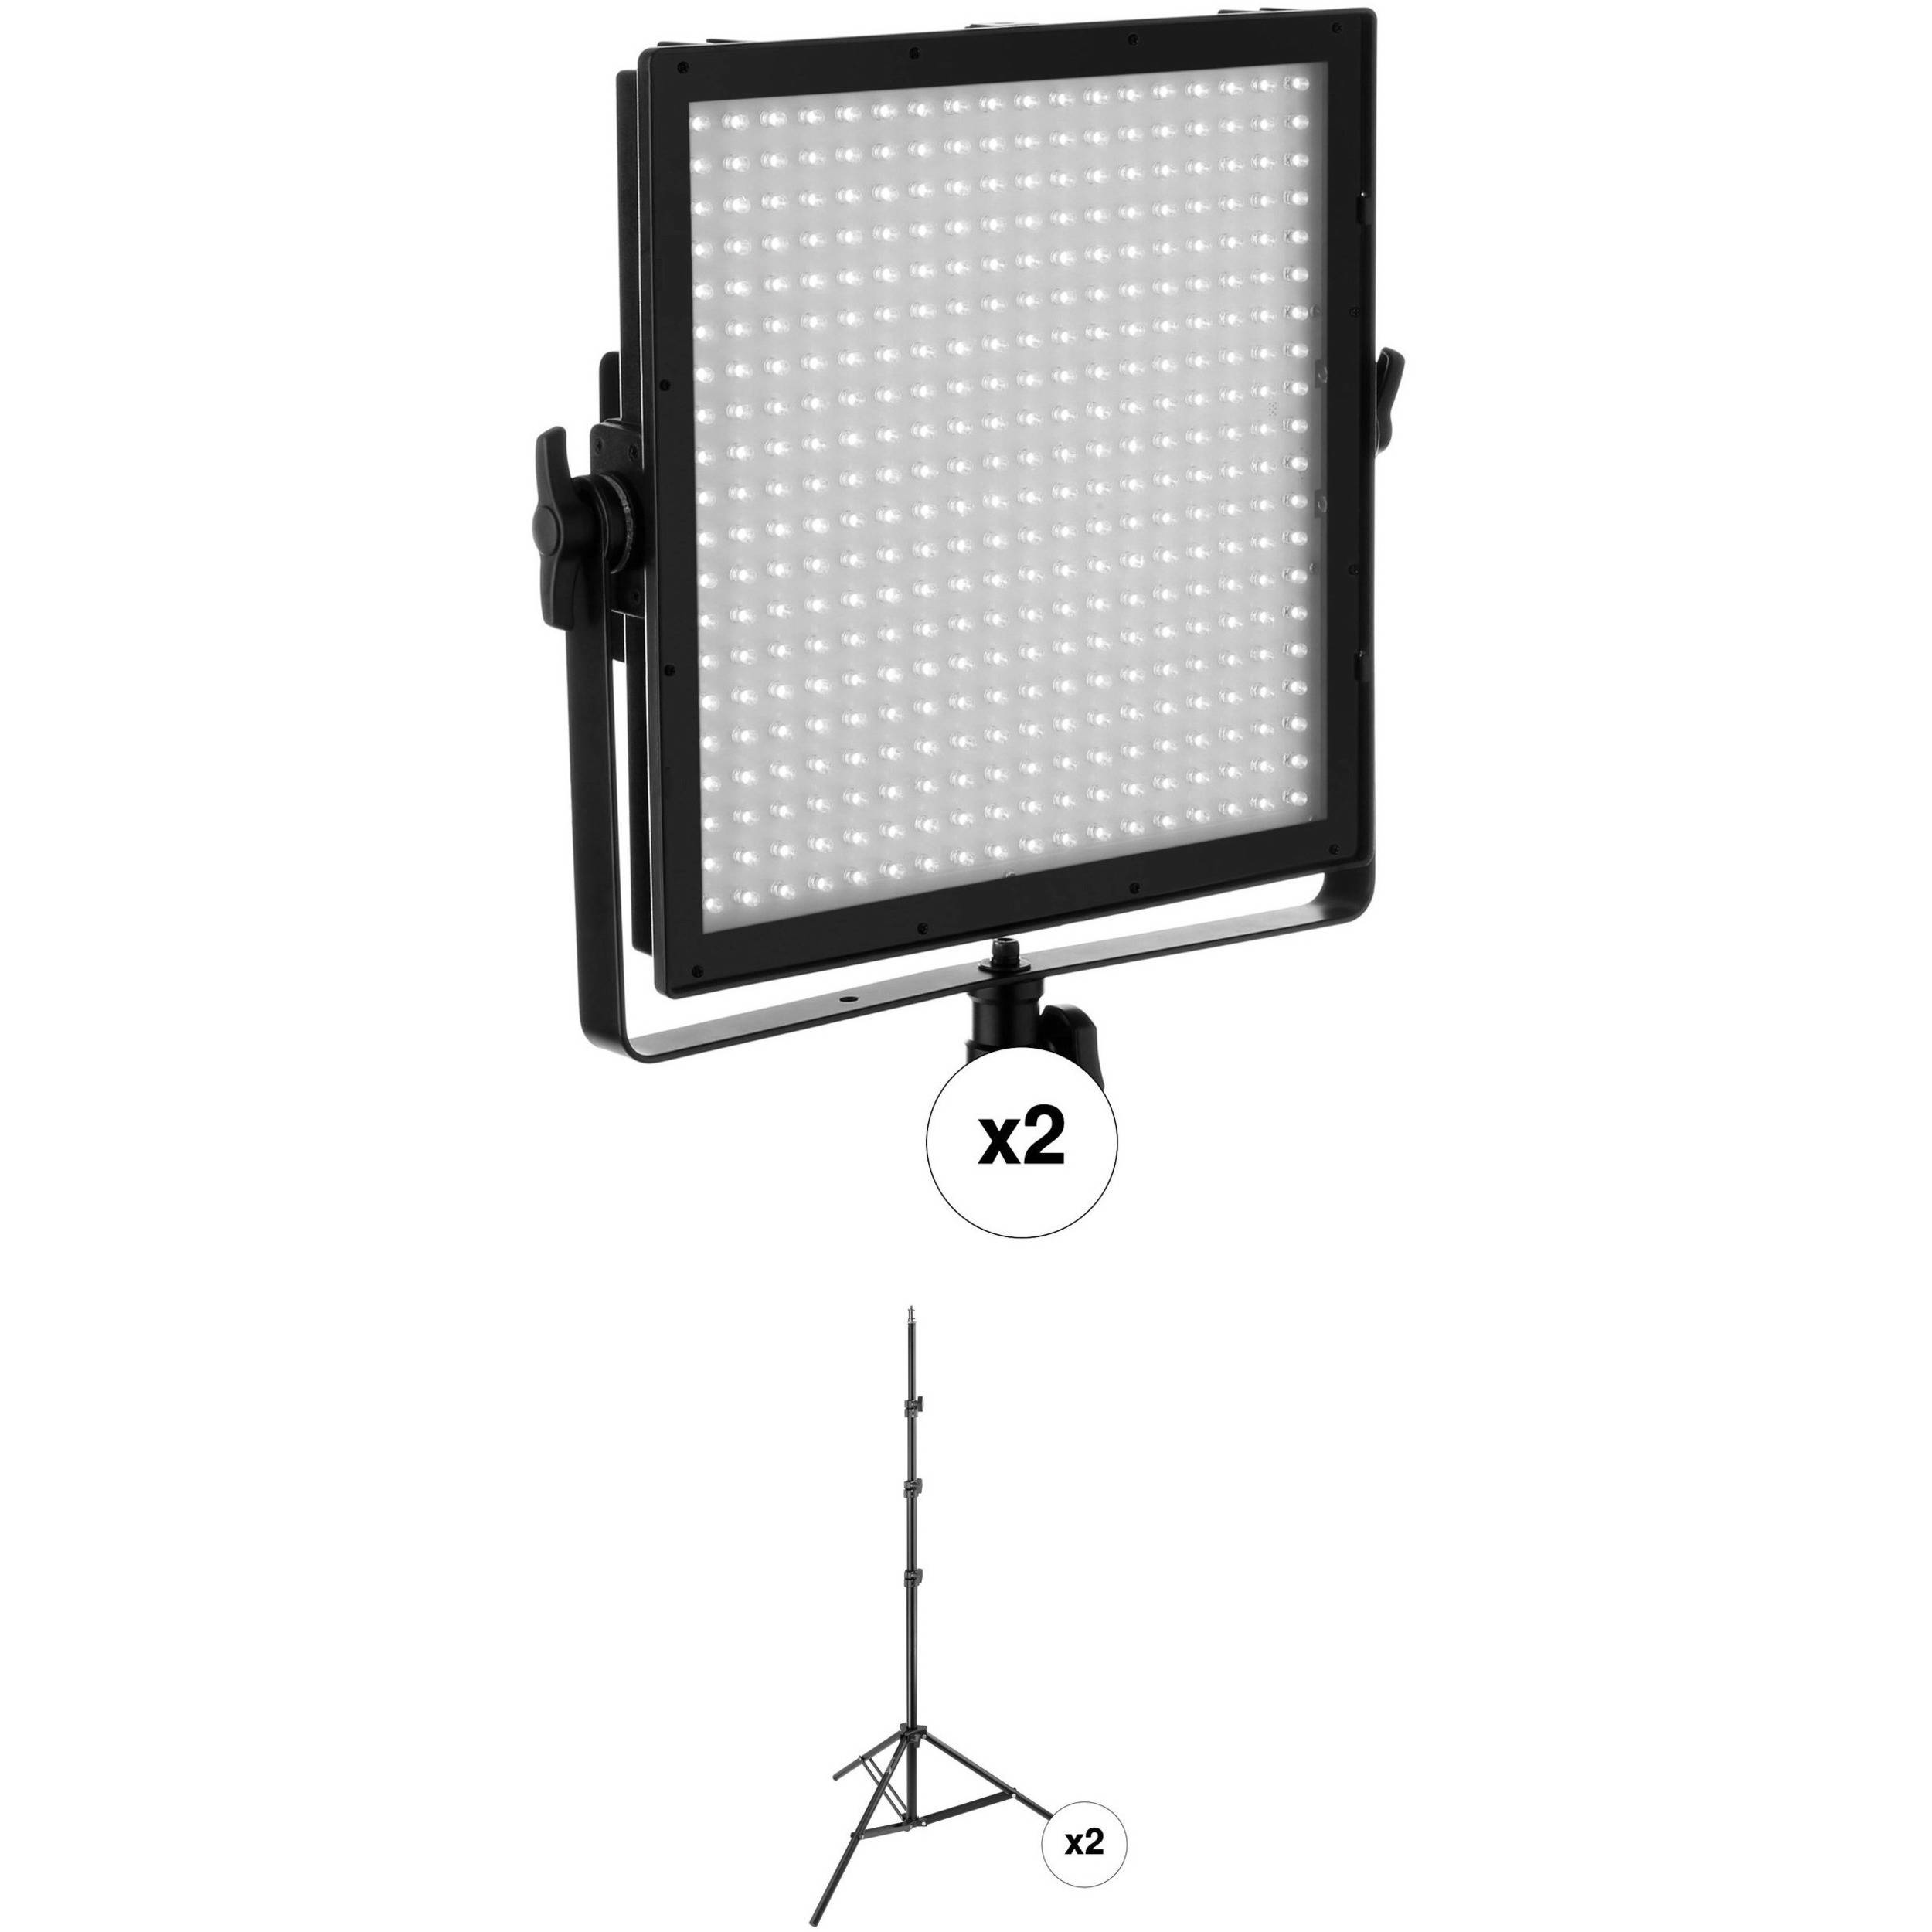 Genaray Spectroled Essential 360 Daylight Led Sp E 360d